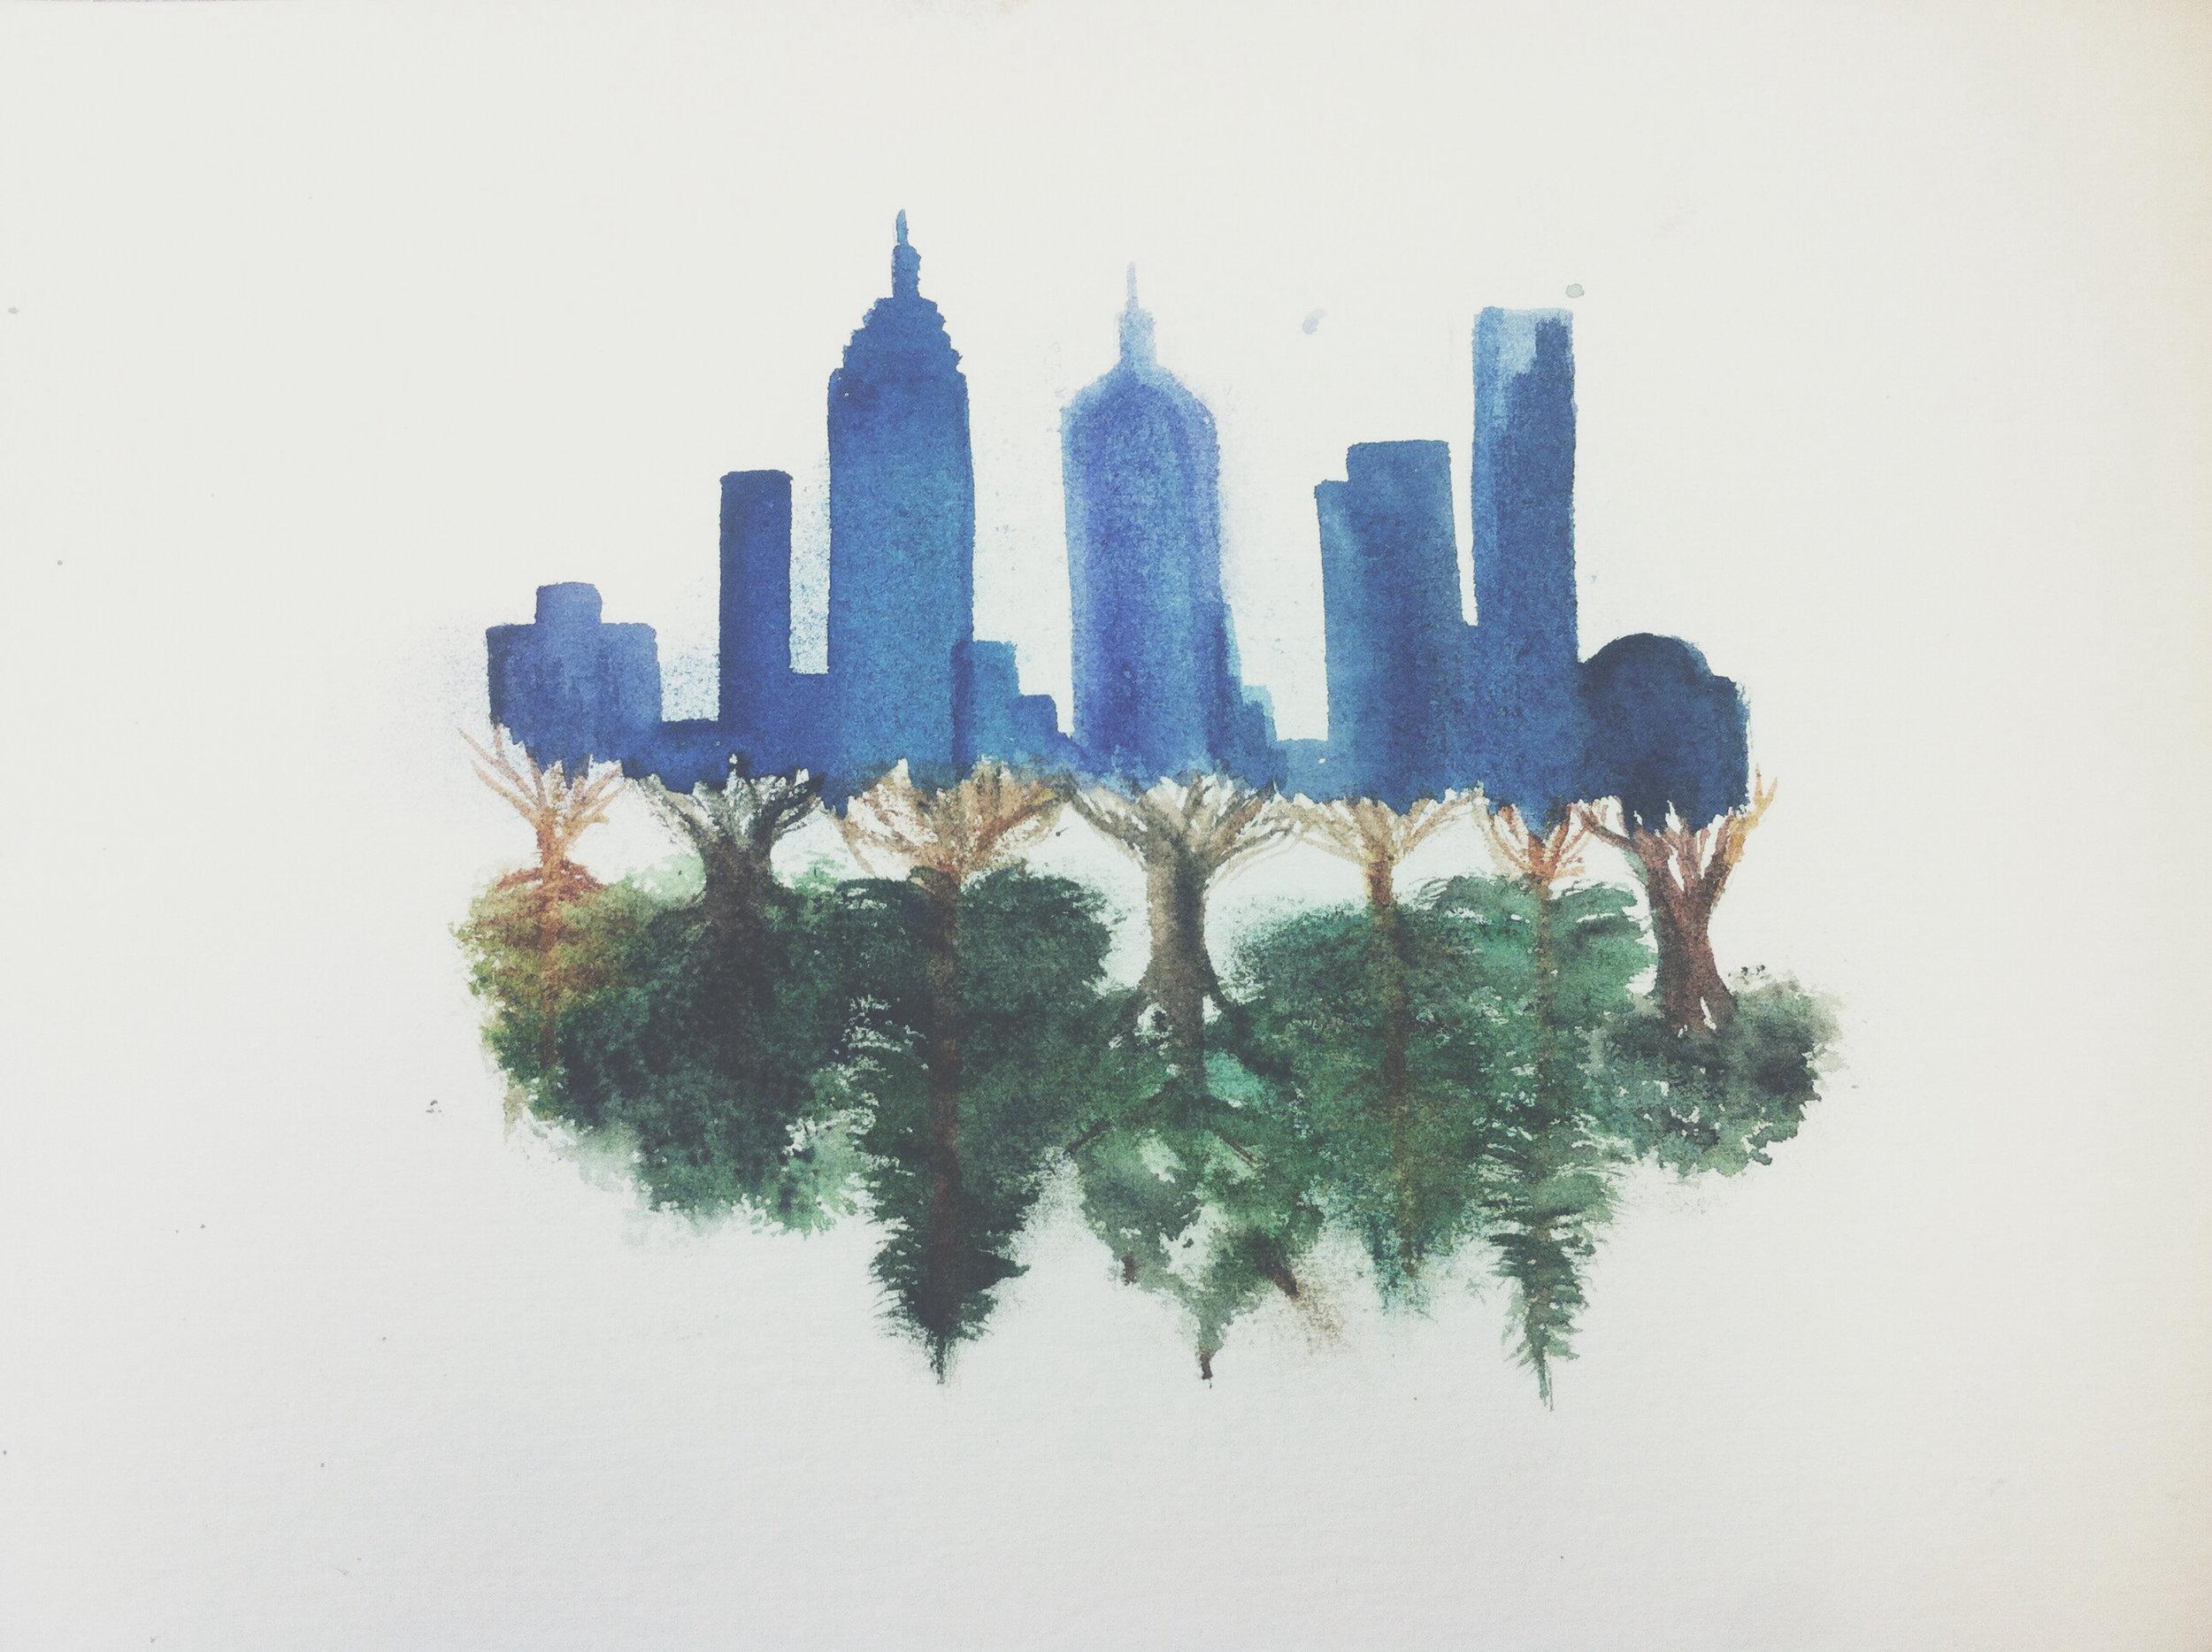 City Trees - Michael Markowski - UMass Wind Ensemble